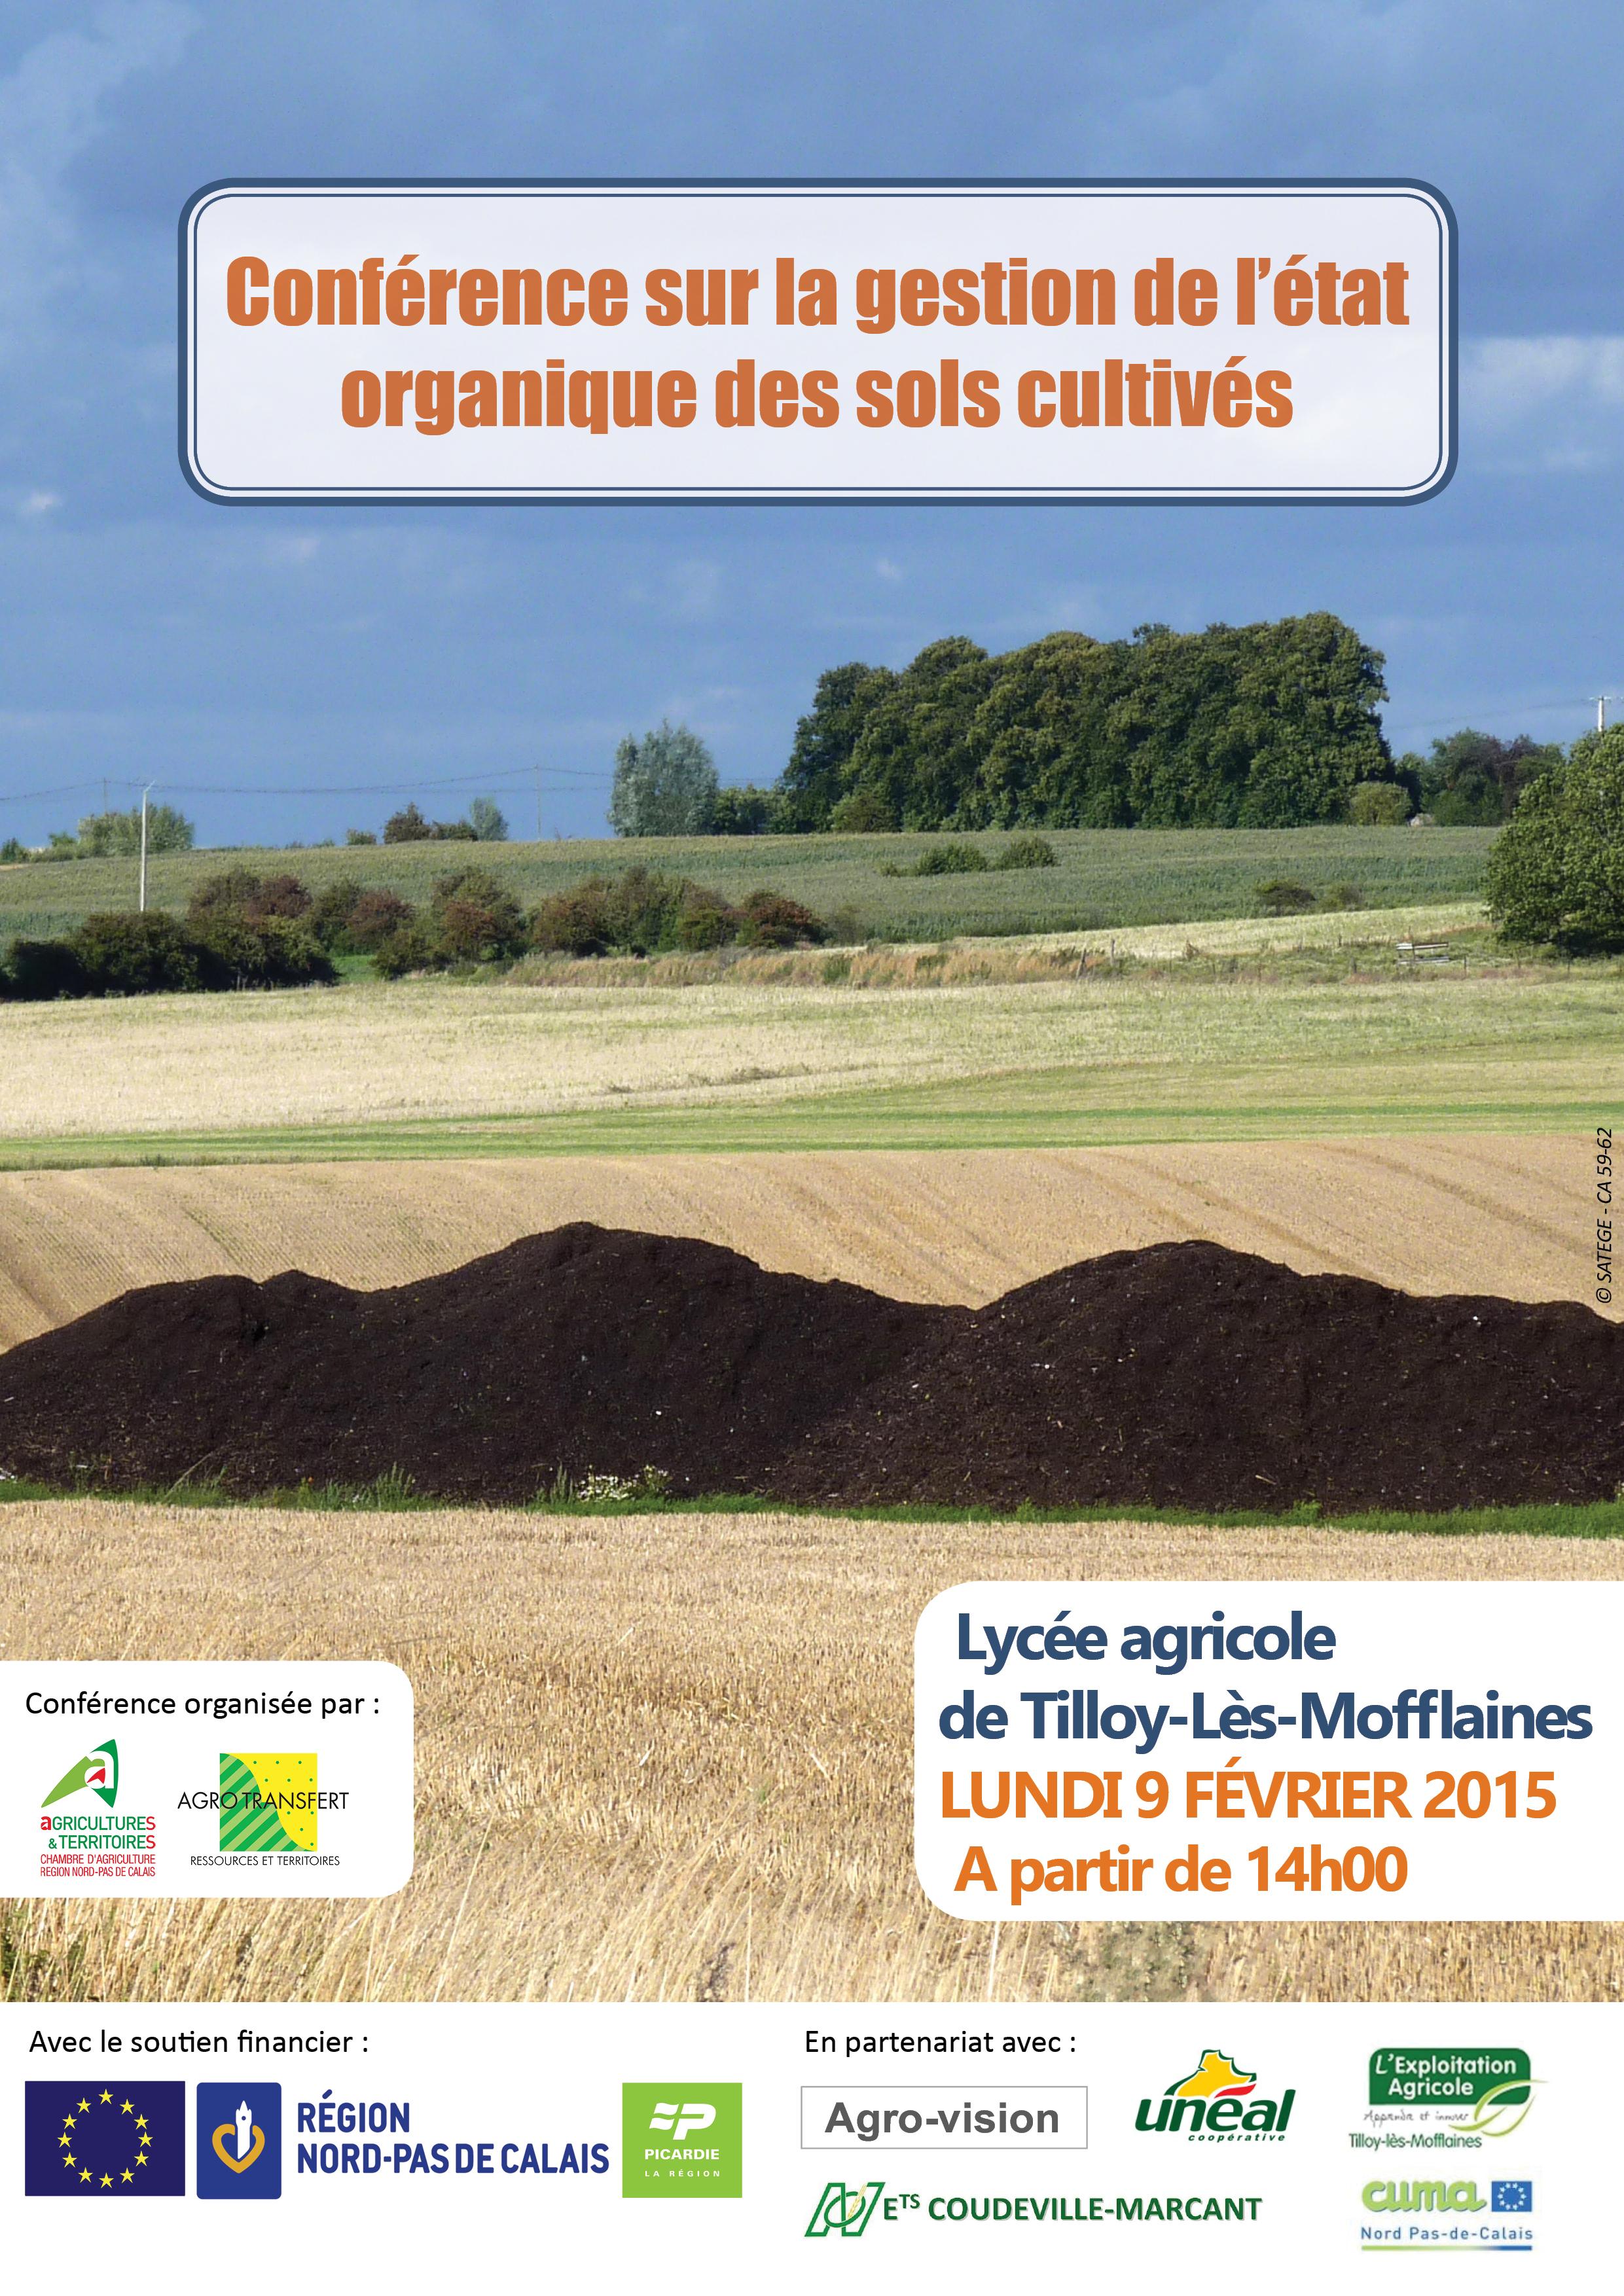 invitation conférence gestion état organique des sols cultivés 9 fev 2015